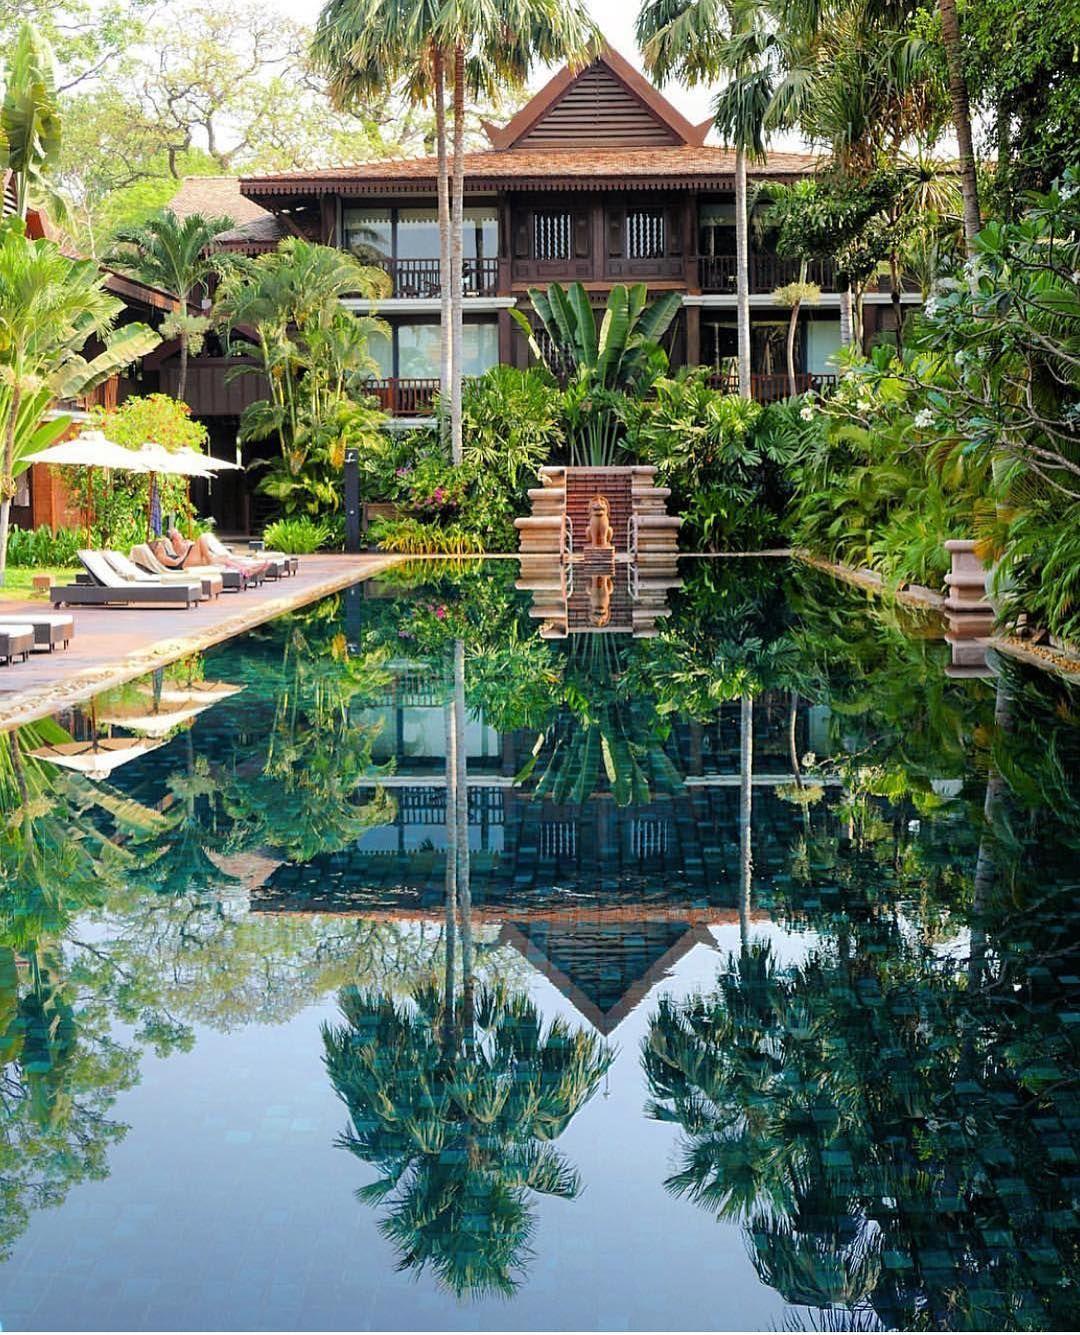 Beach wedding spots  Belmond la Residence de Angkor  Cambodia Credits naelan